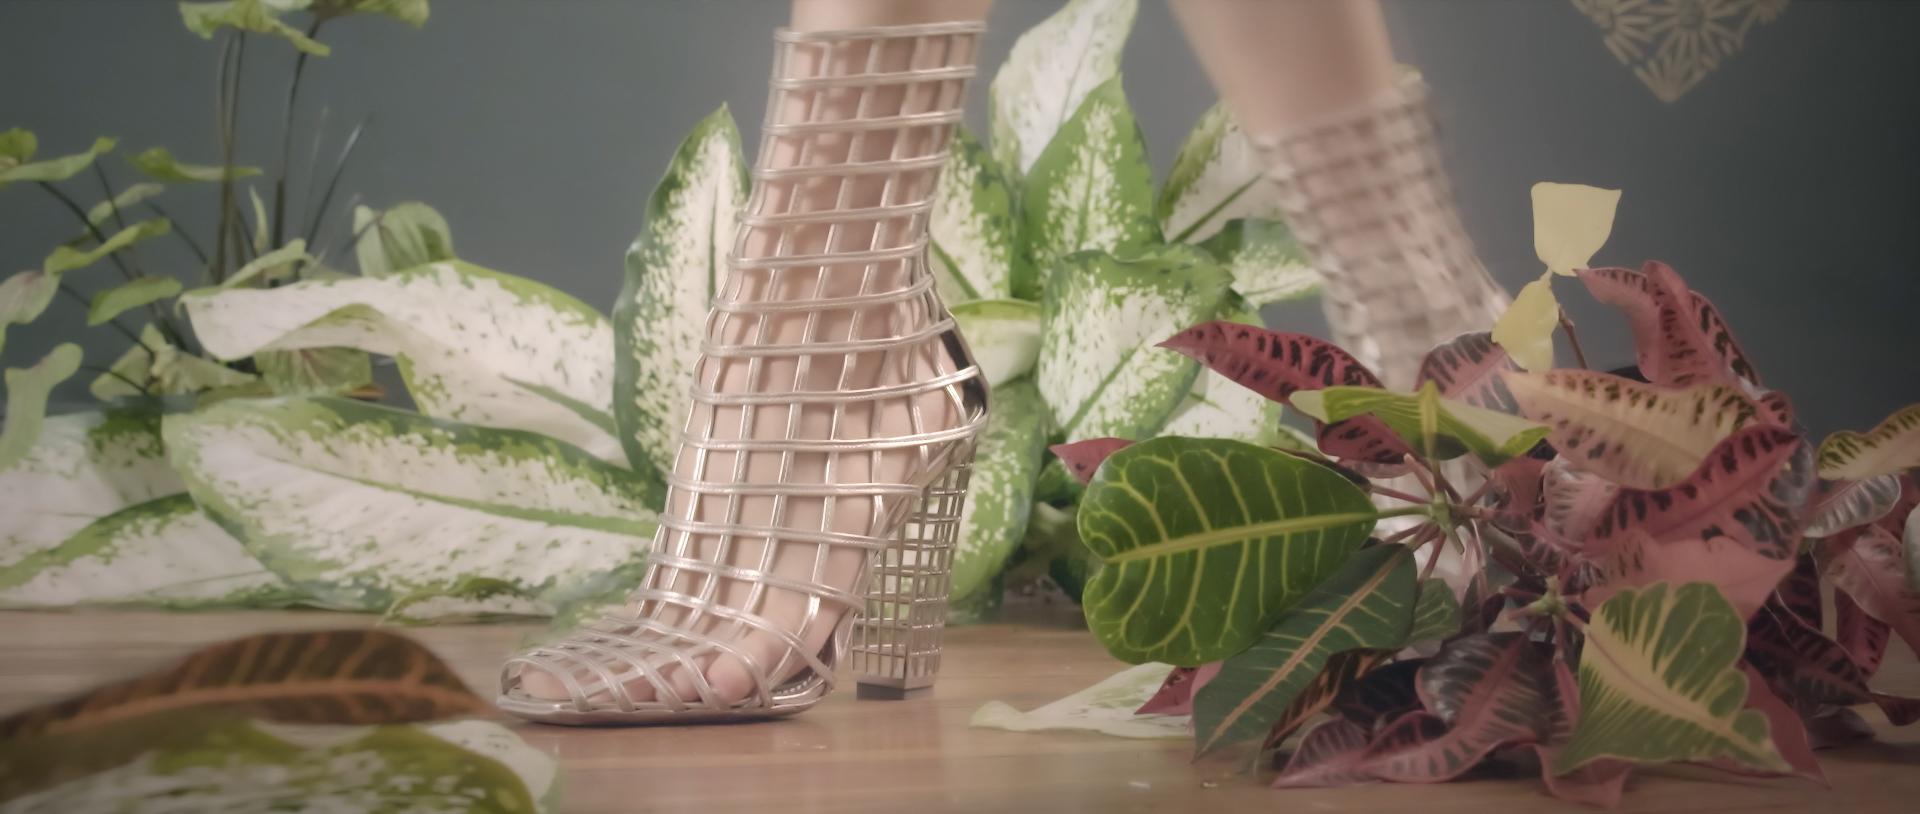 silver shoe step.jpg